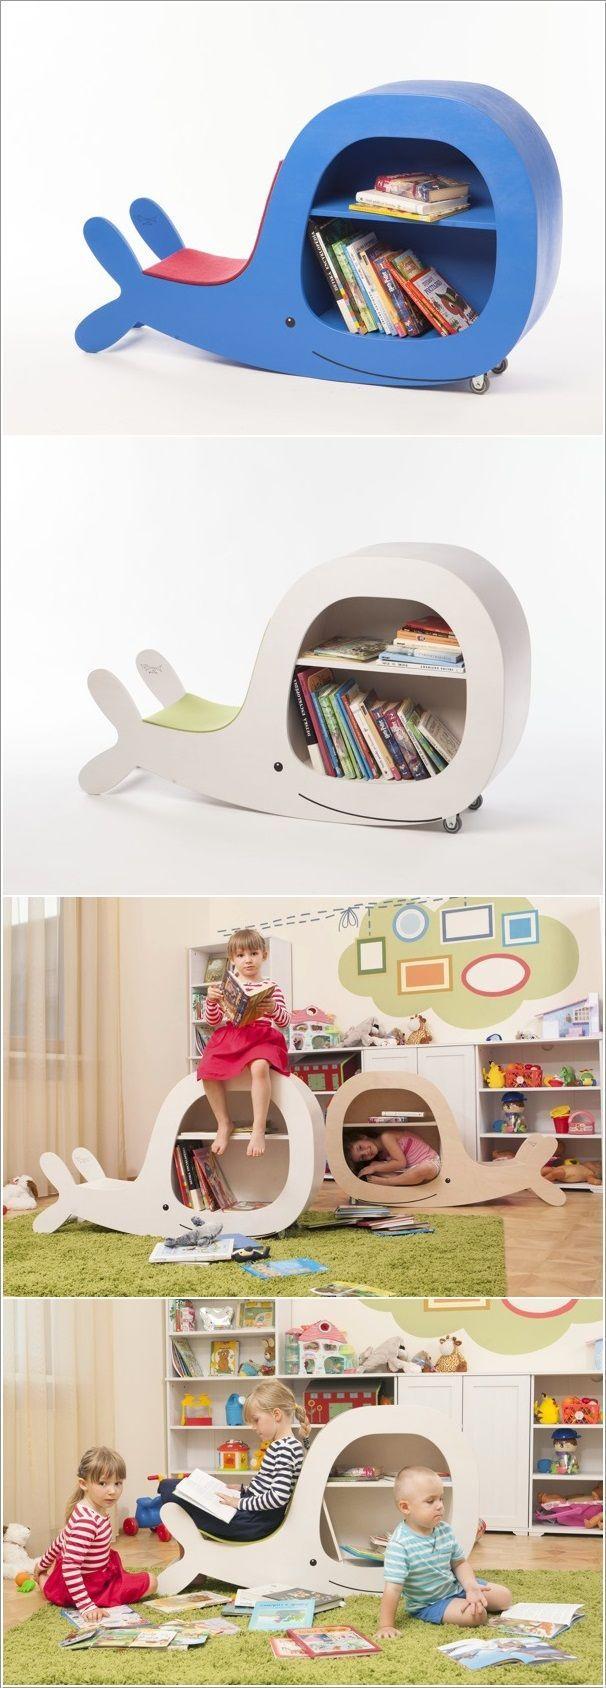 DIY Kids Home Garden Using Plywood | toy | Pinterest | Guardería de ...